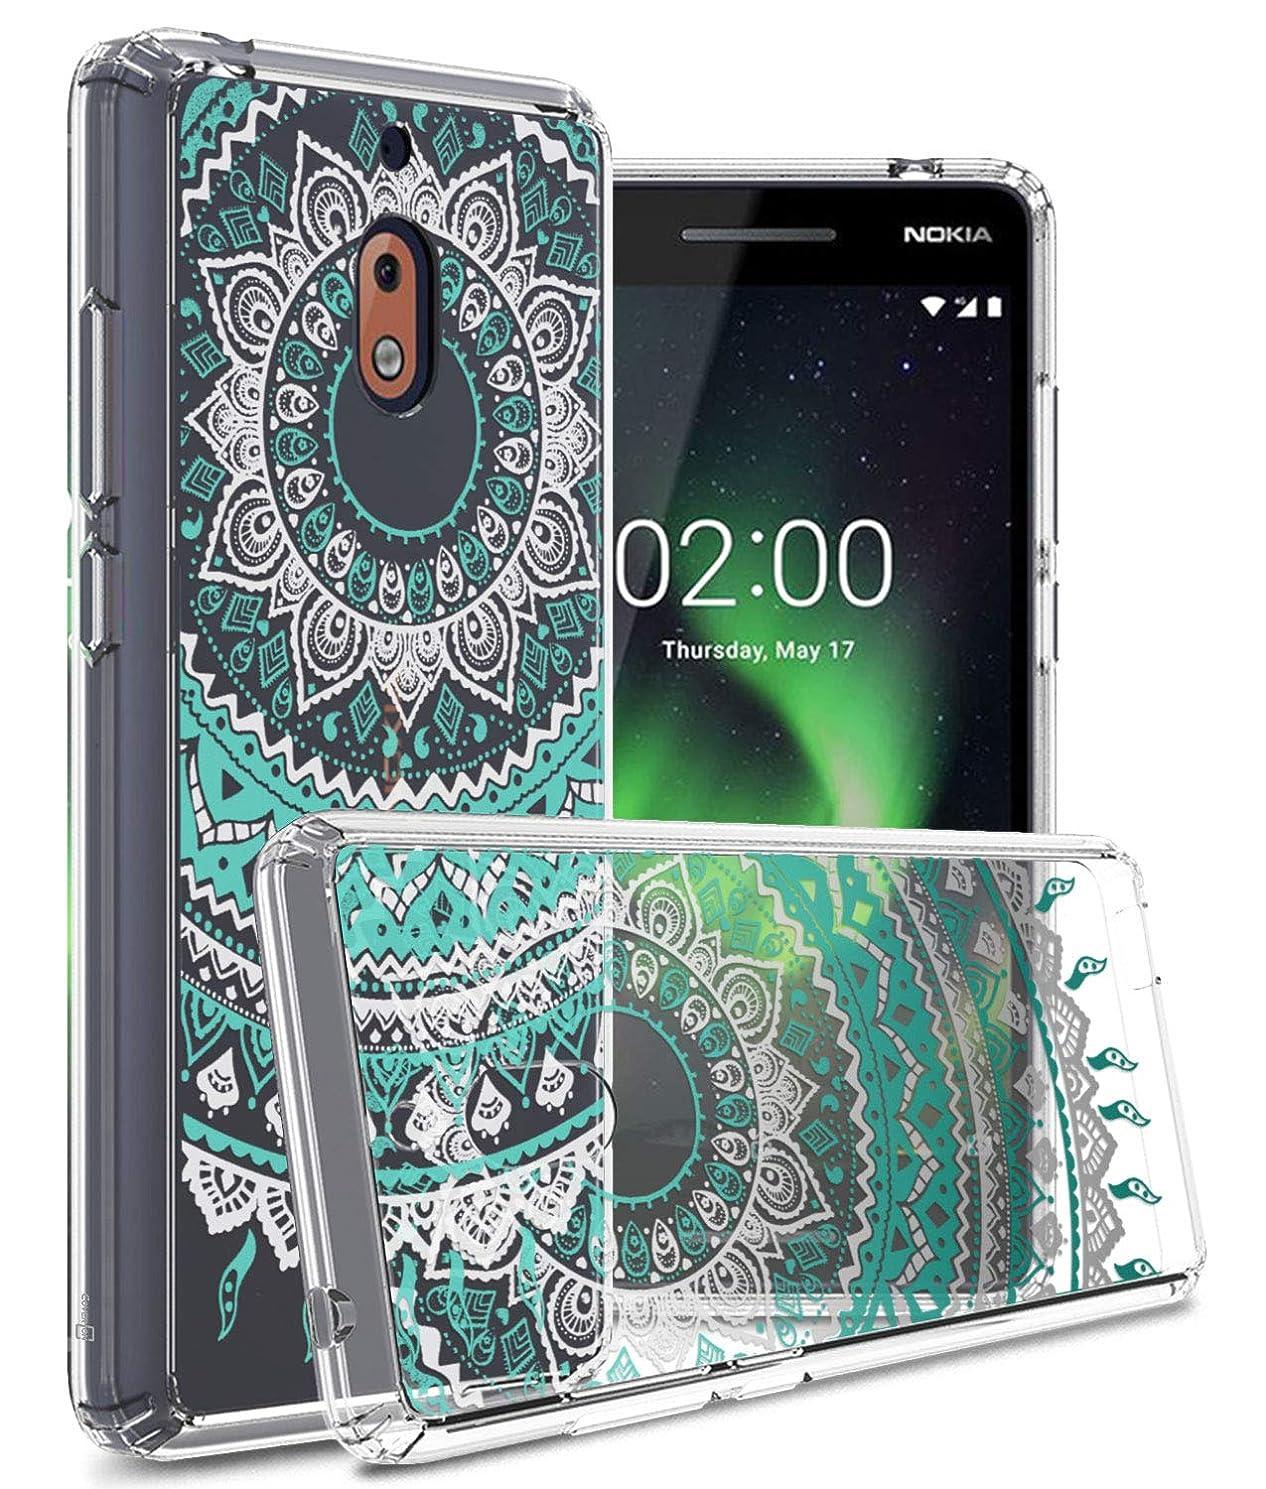 Nokia 2V Case, Nokia 2.1 Case, CoverON ClearGuard Series Premium Slim Fit Hard Phone Case with TPU Grip Bumpers - Teal Mandala Design